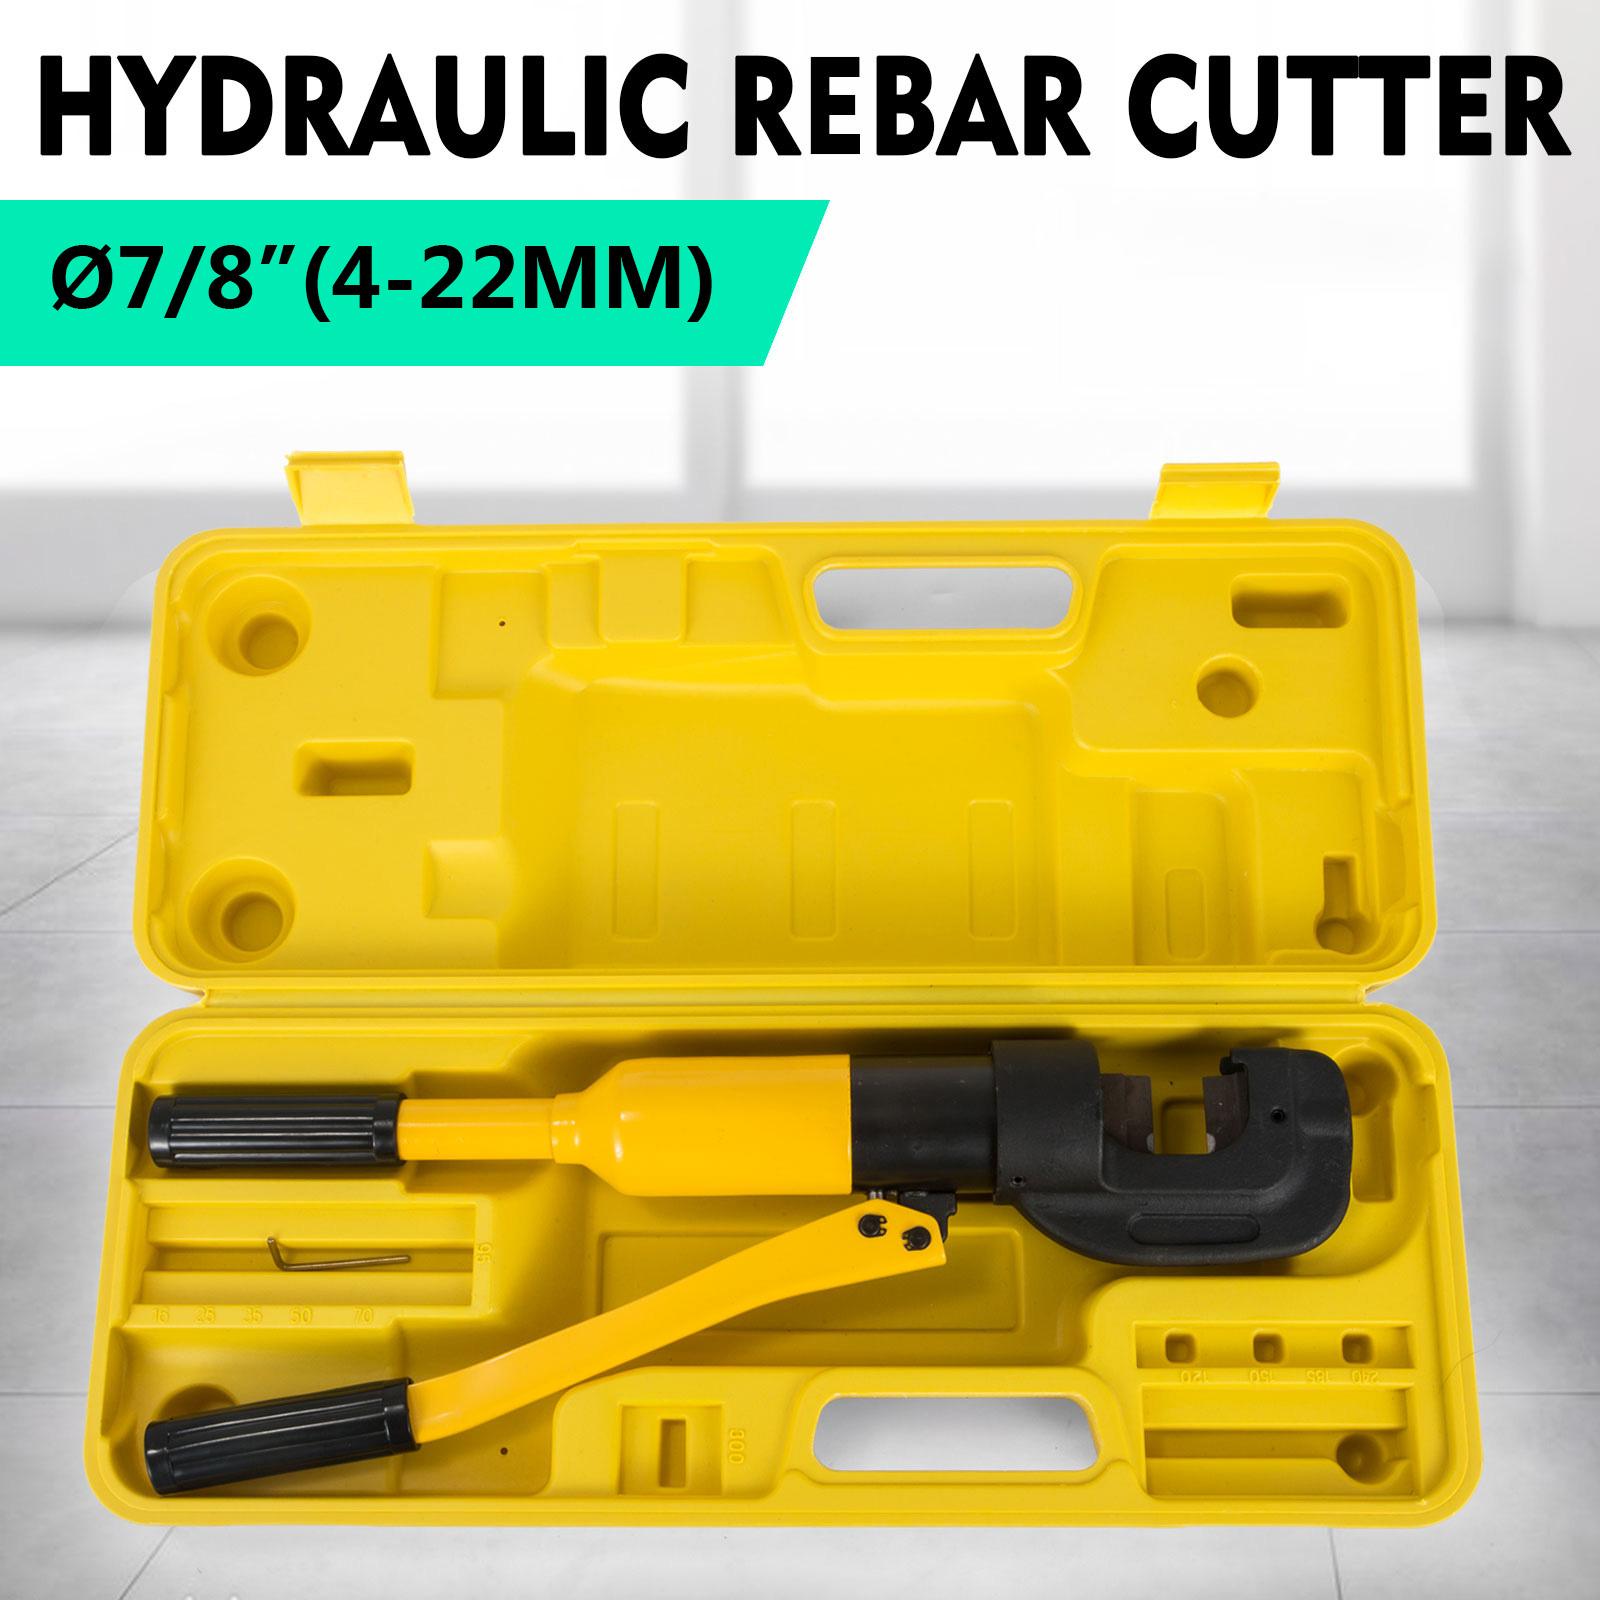 Handheld Hydraulic Rebar Cutter cuts 4 mm to 22 mm 12 ton